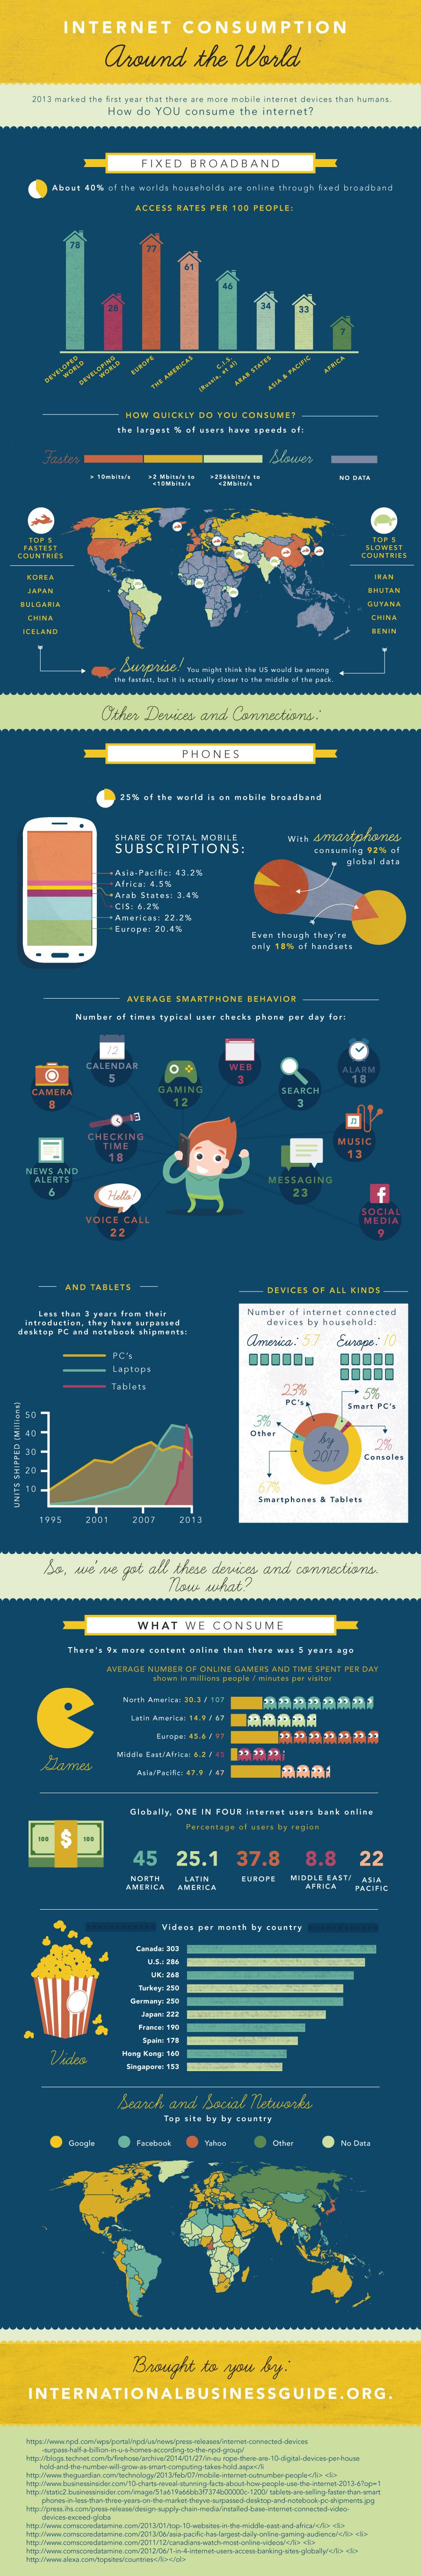 internet consumption